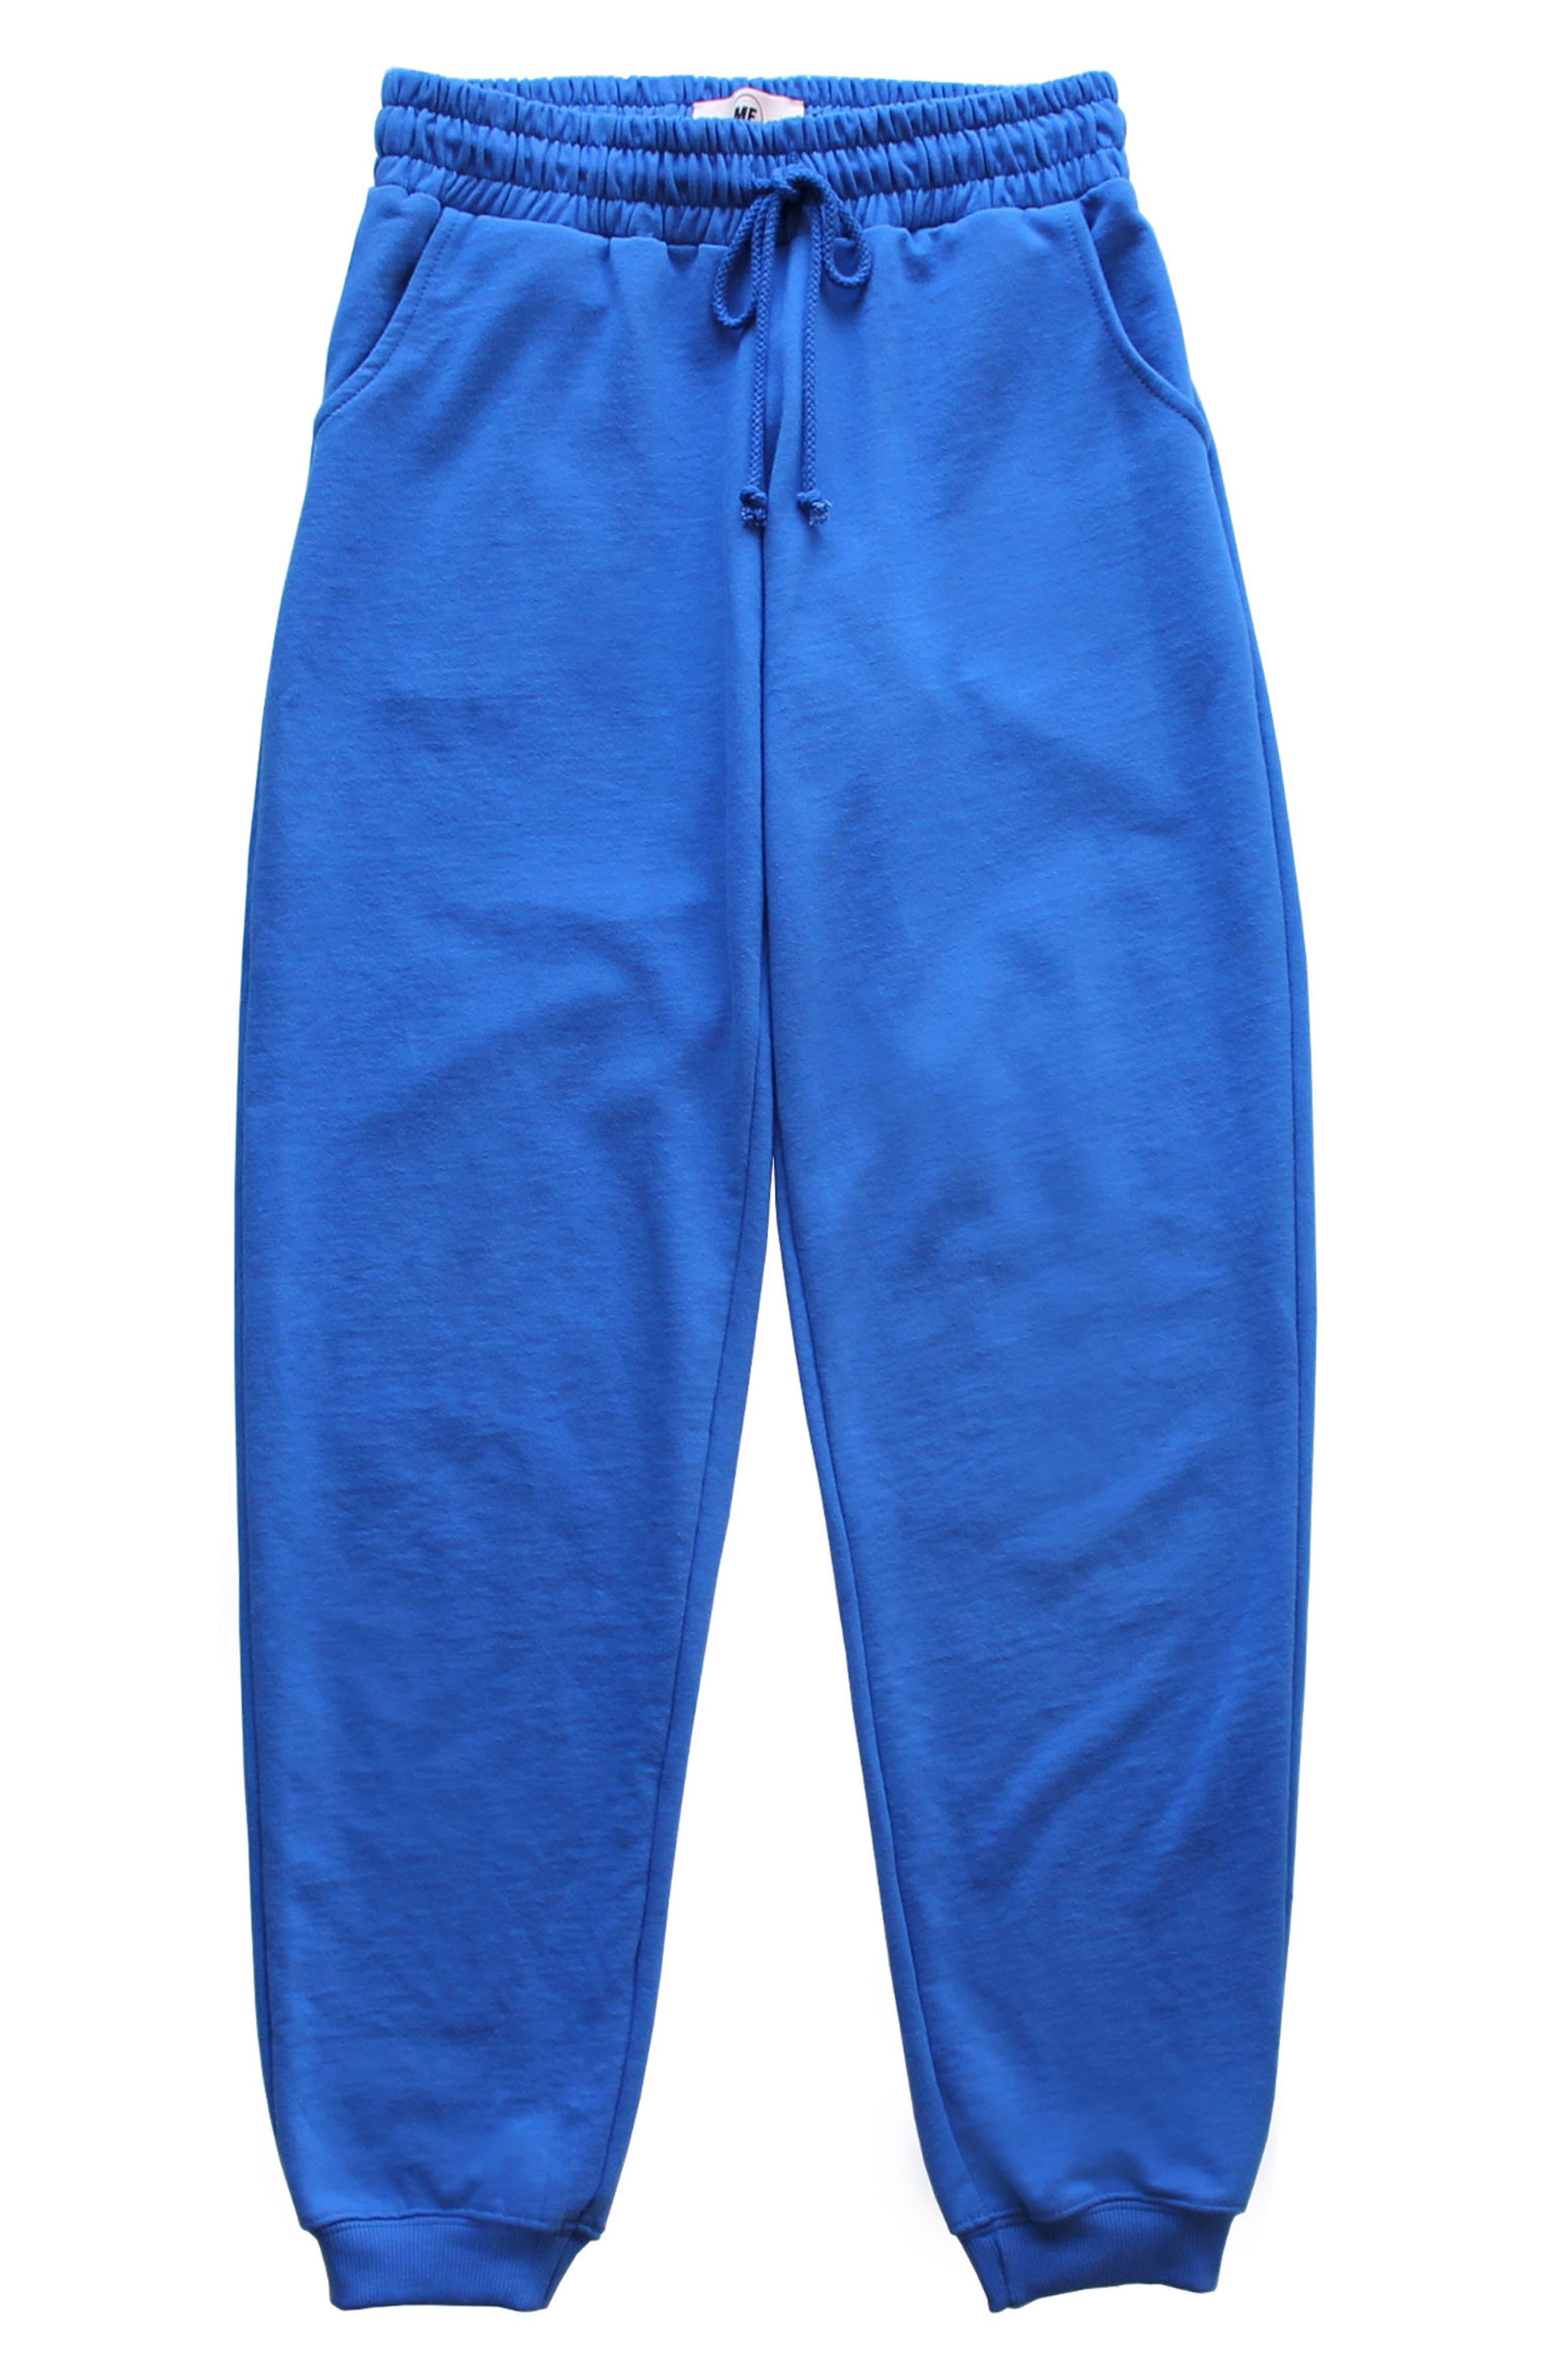 ME. Rose Sweatpants,                             Main thumbnail 1, color,                             400